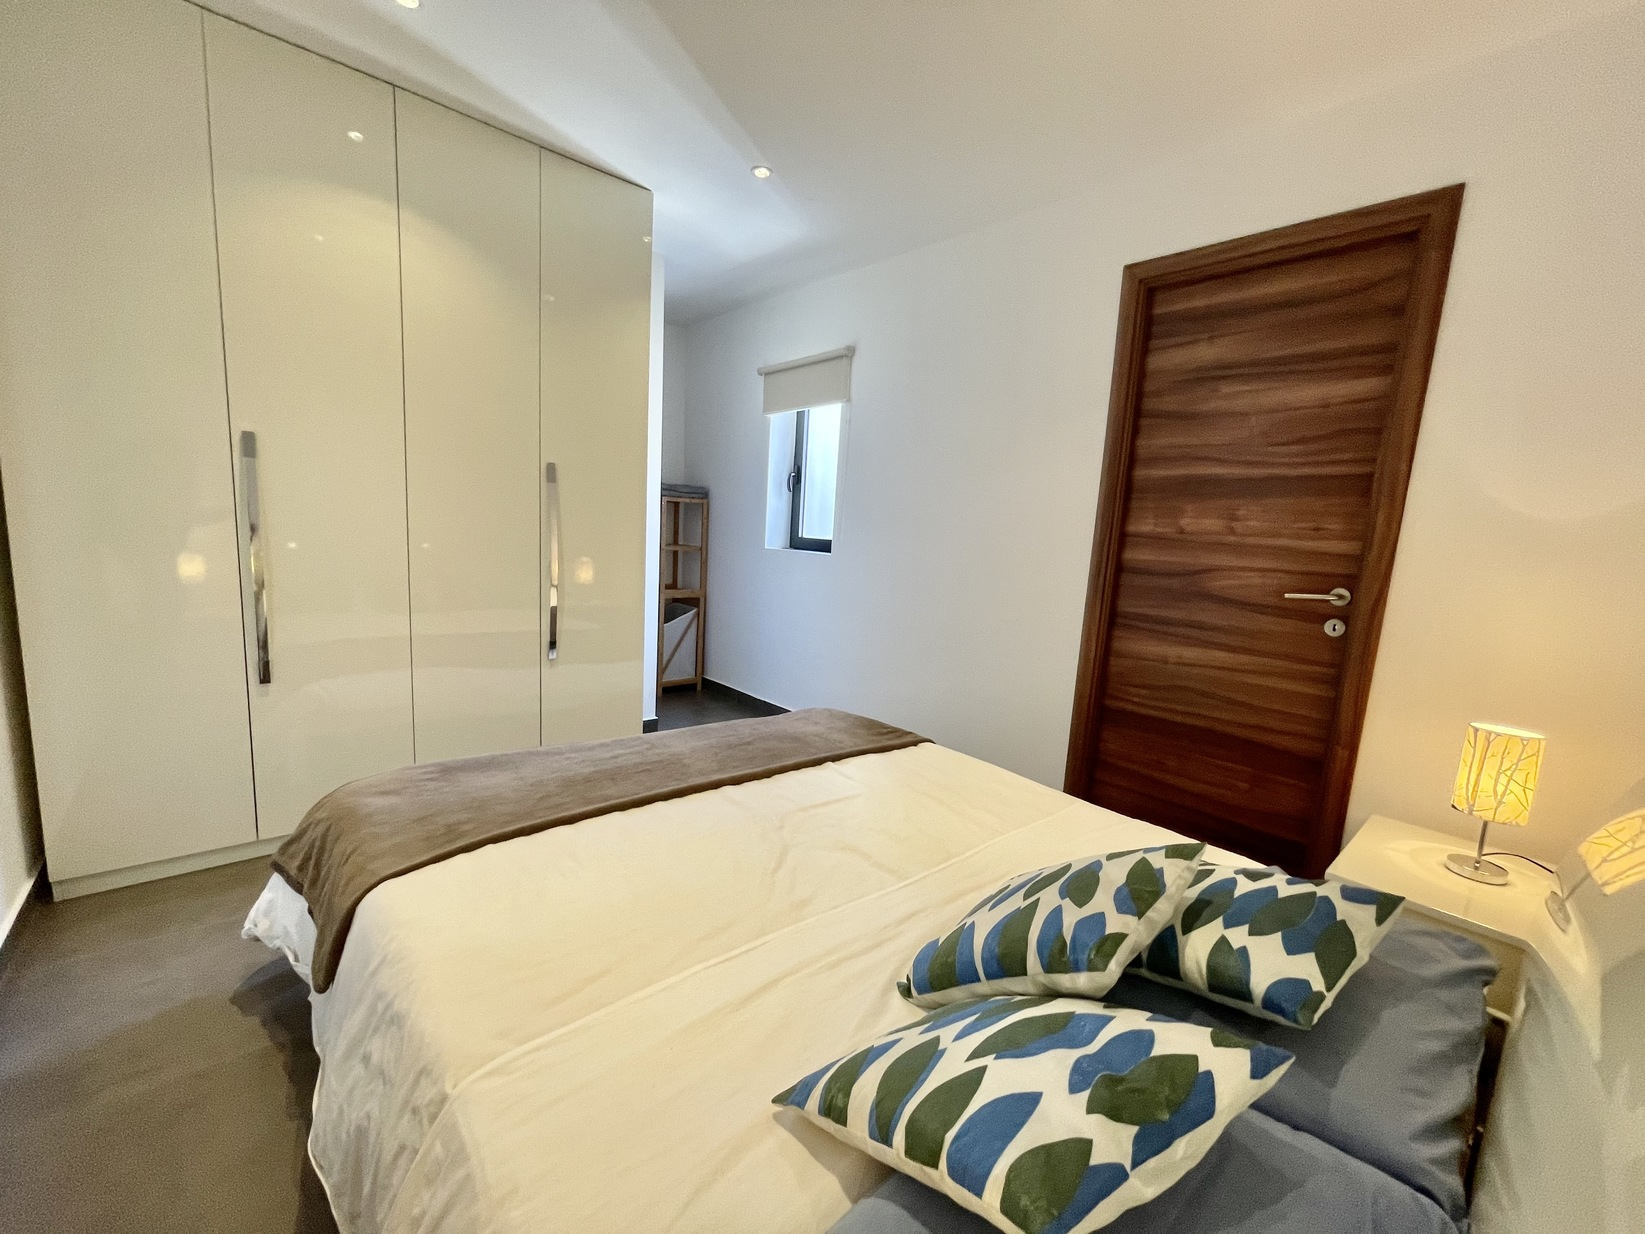 2 bed Apartment For Rent in Sliema, Sliema - thumb 16